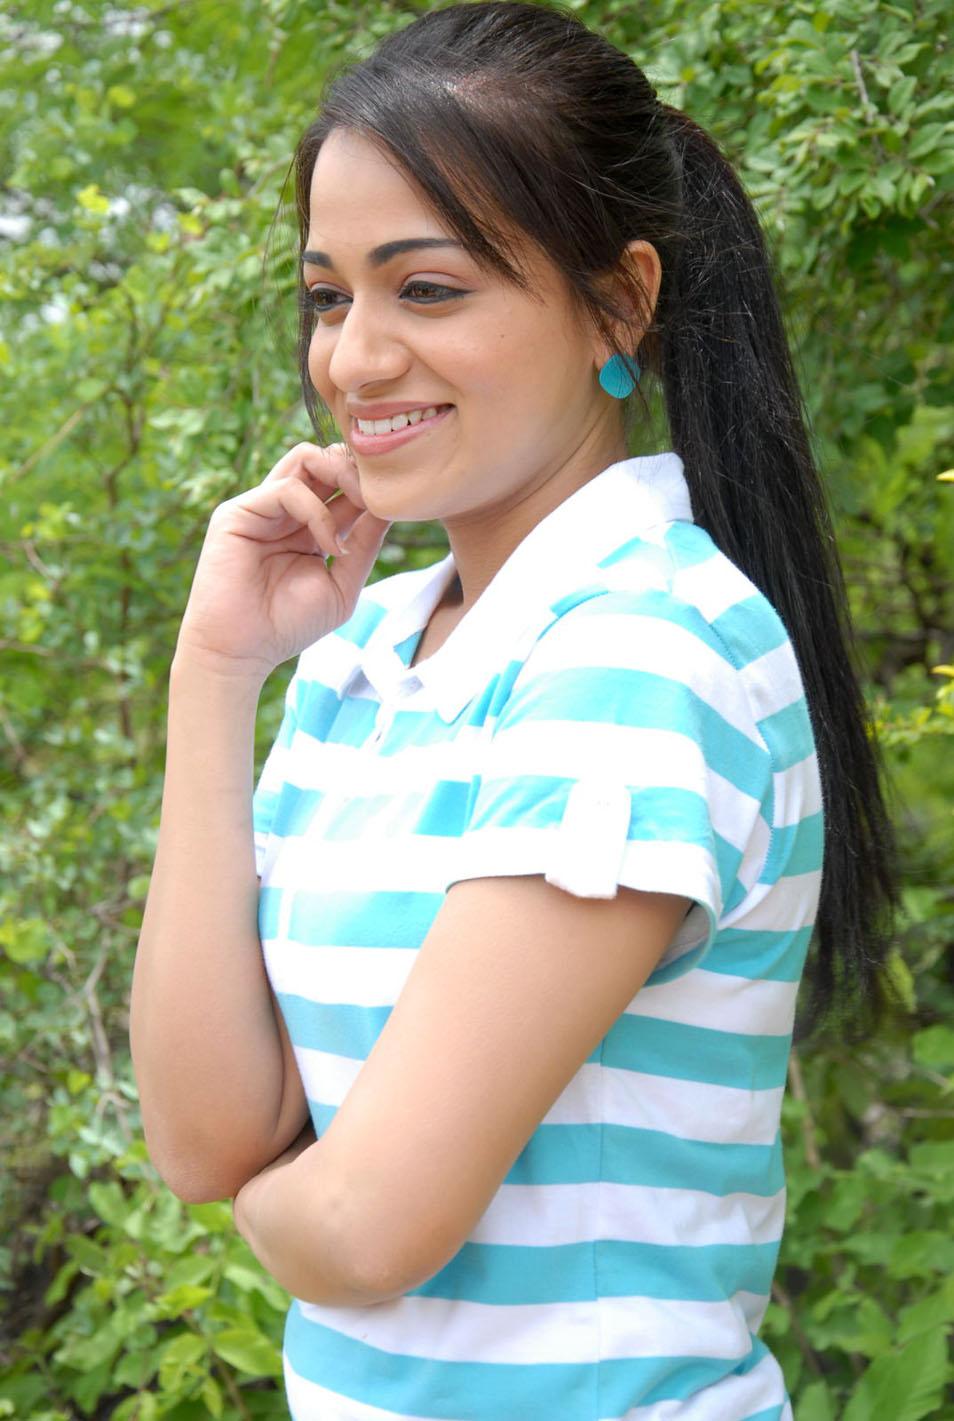 Reshma Naked Images Stunning celeb pic: reshma hot pictures,reshma latest stills,reshma latest